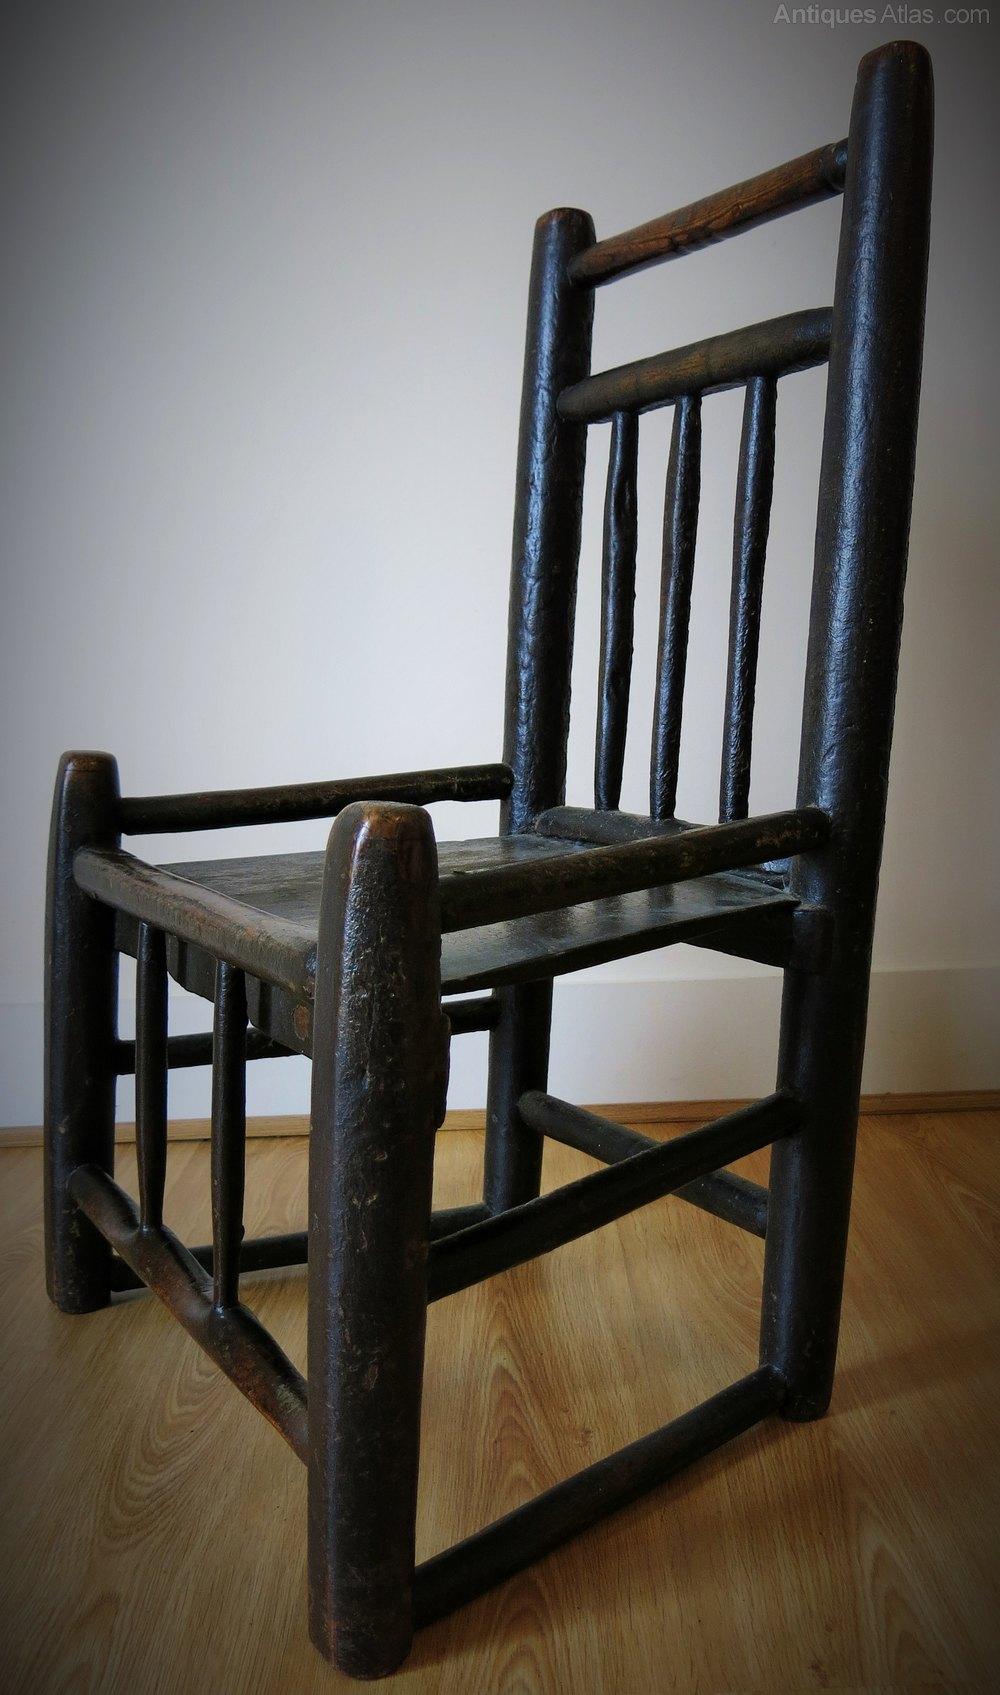 Primitive Painted Ash Turners Chair 18thC Antiques Atlas